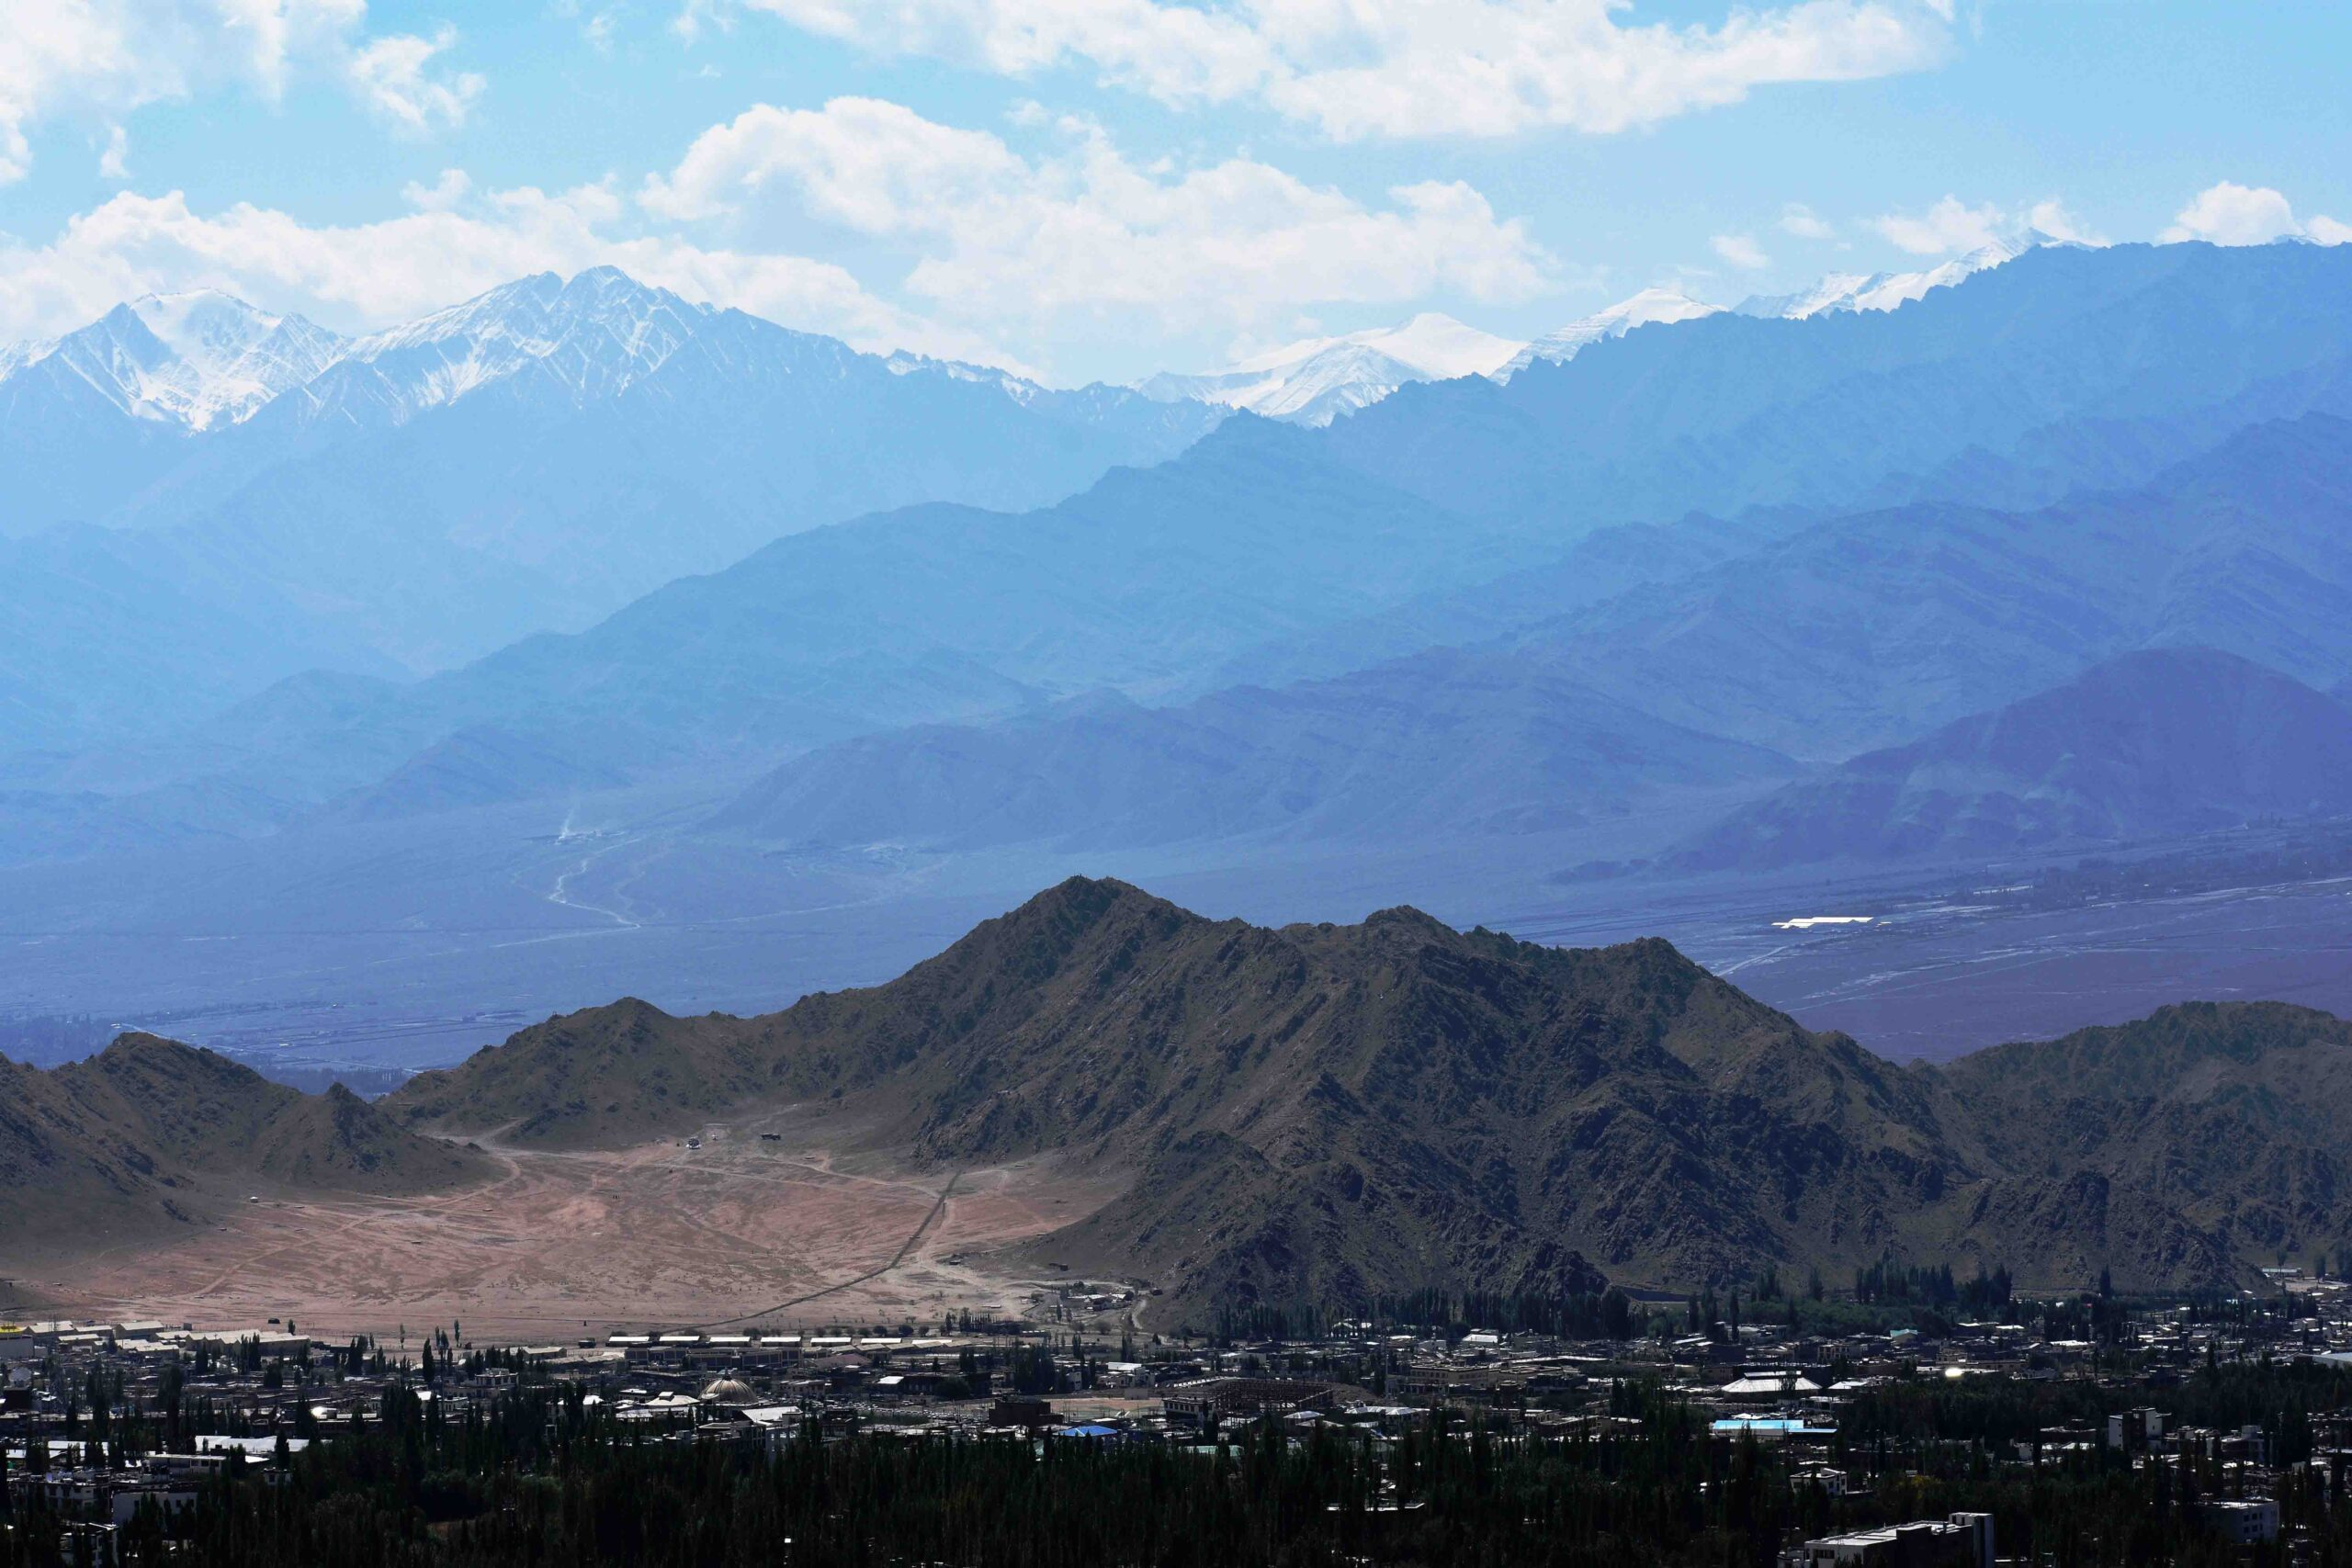 Ladakh: The Land of High Passes